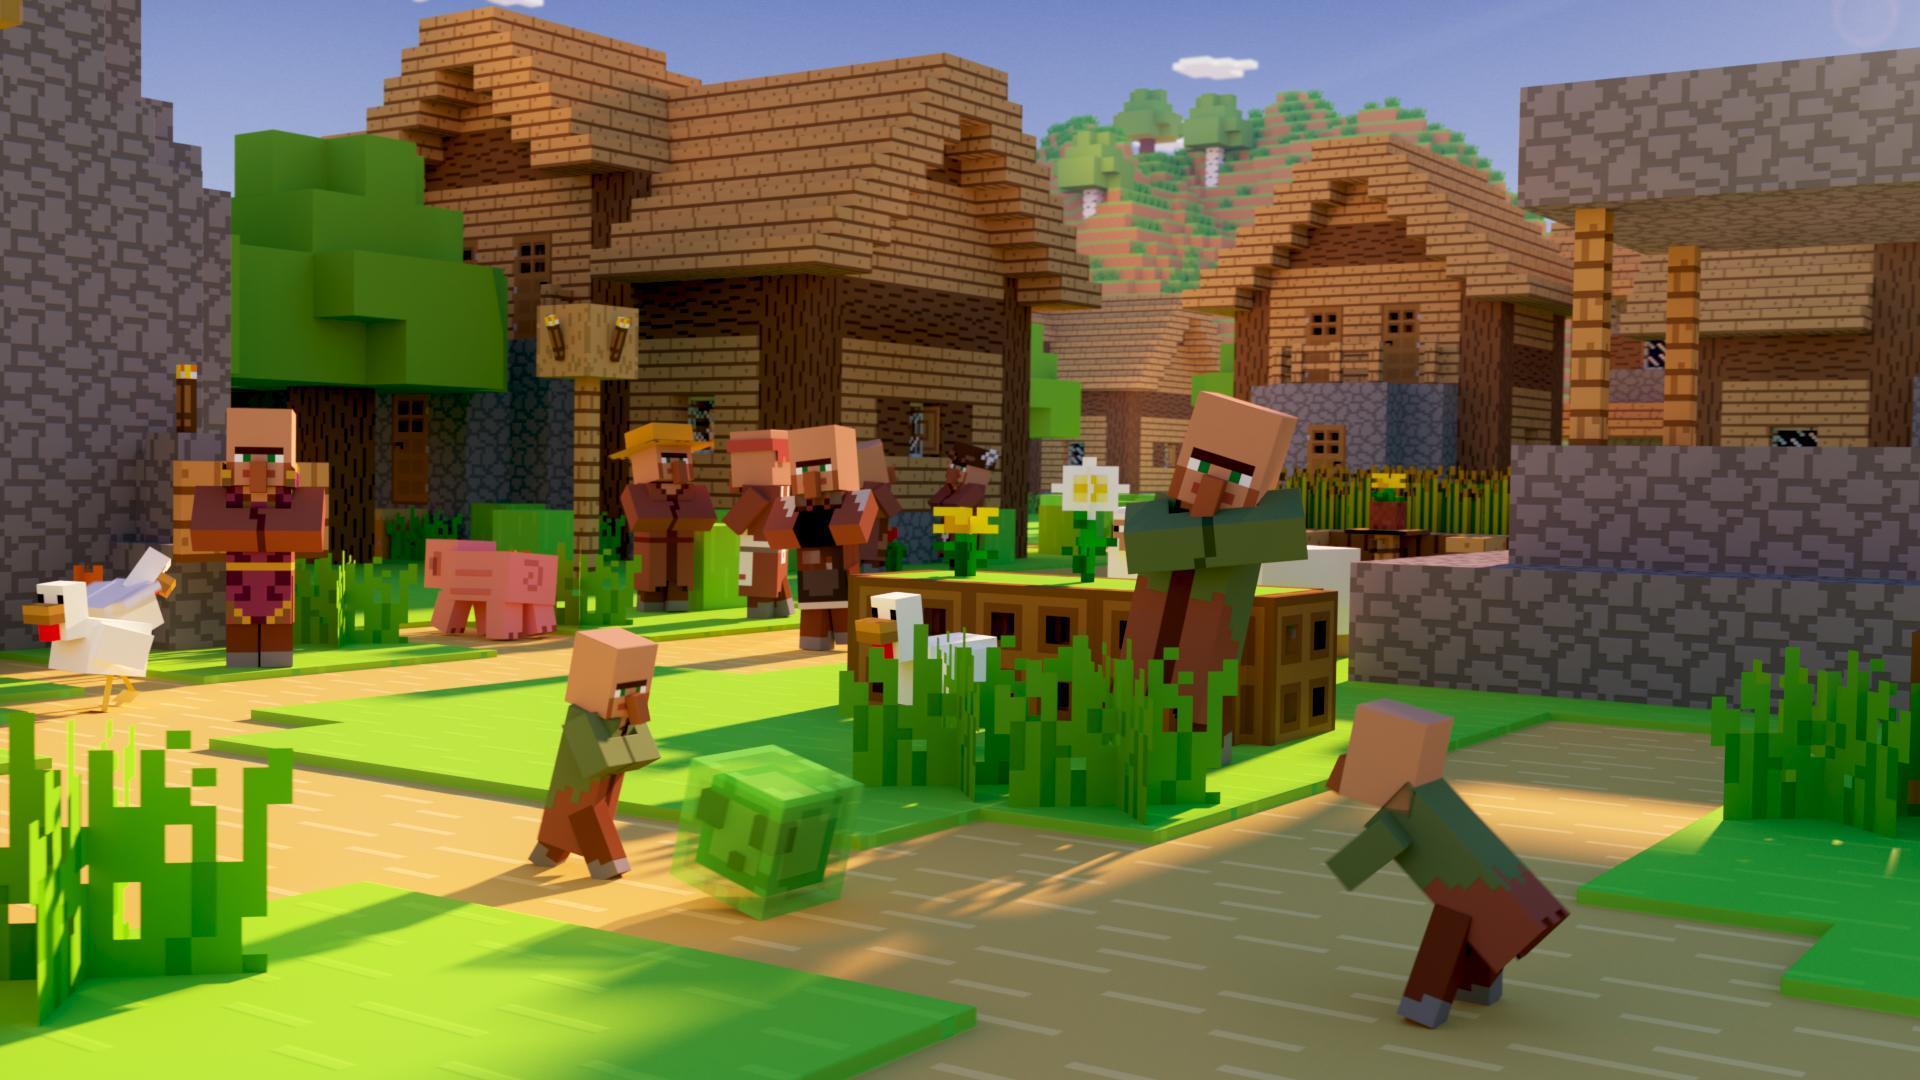 Cheats Minecraft, Cheat Codes Minecraft para Android - APK Baixar